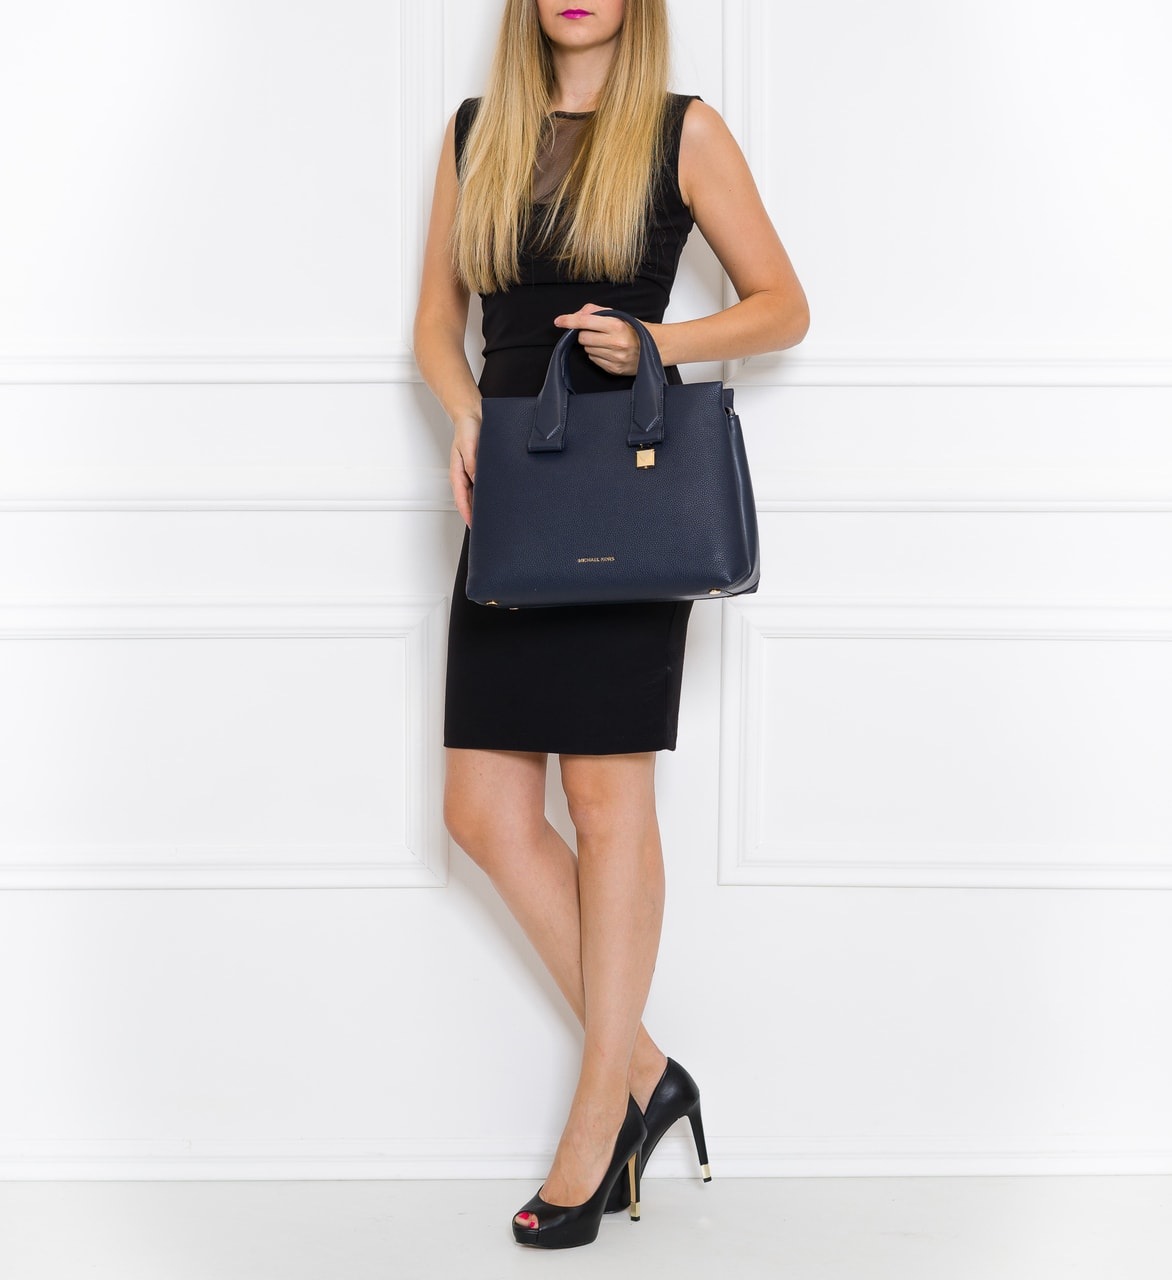 Glamadise - Italian fashion paradise - Women s real leather handbag ... 9e62c23f5d